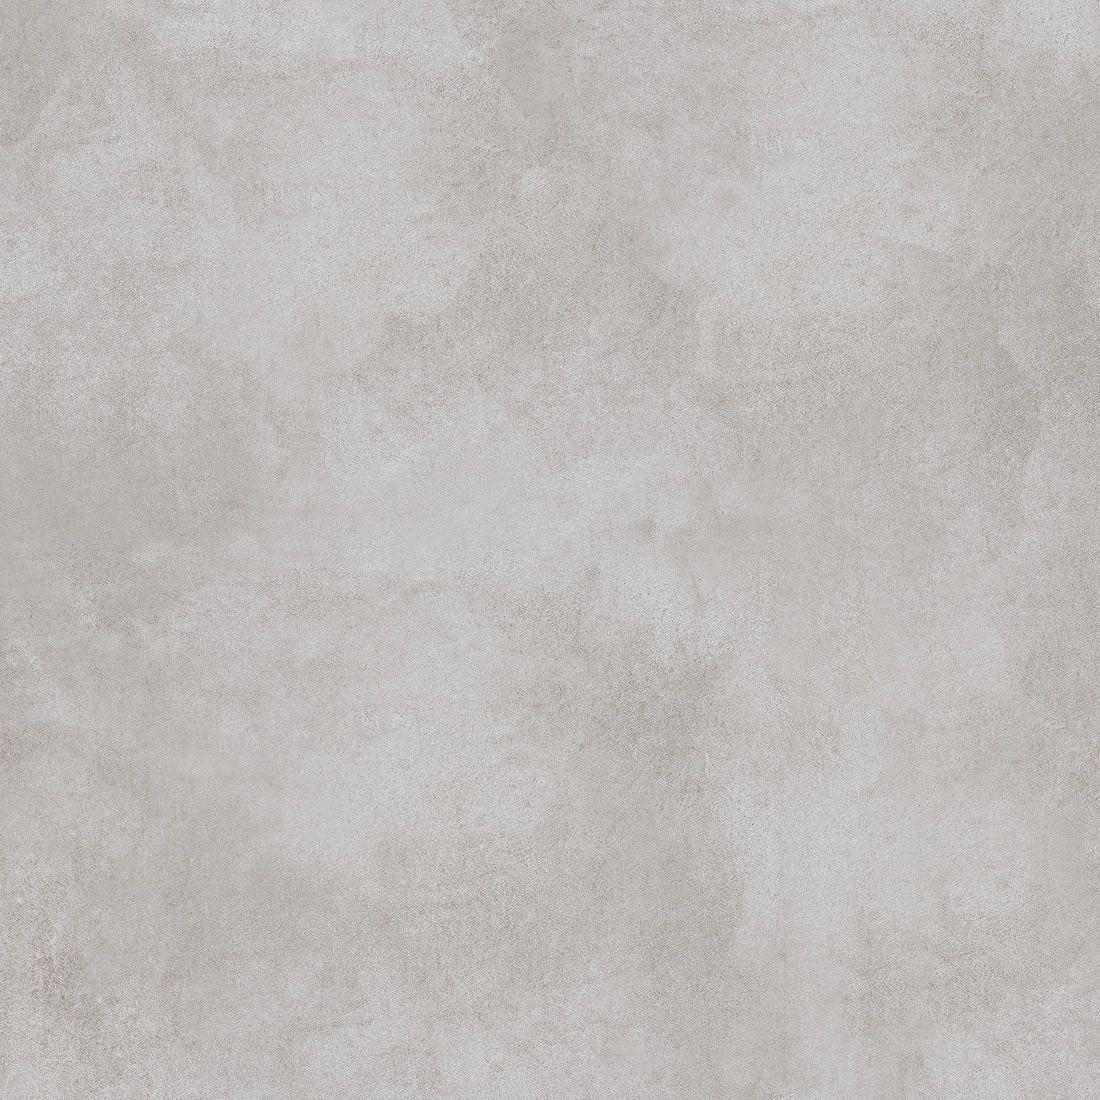 Piso Incopisos 57x57 Ref: 090025 HD Extra Cimento